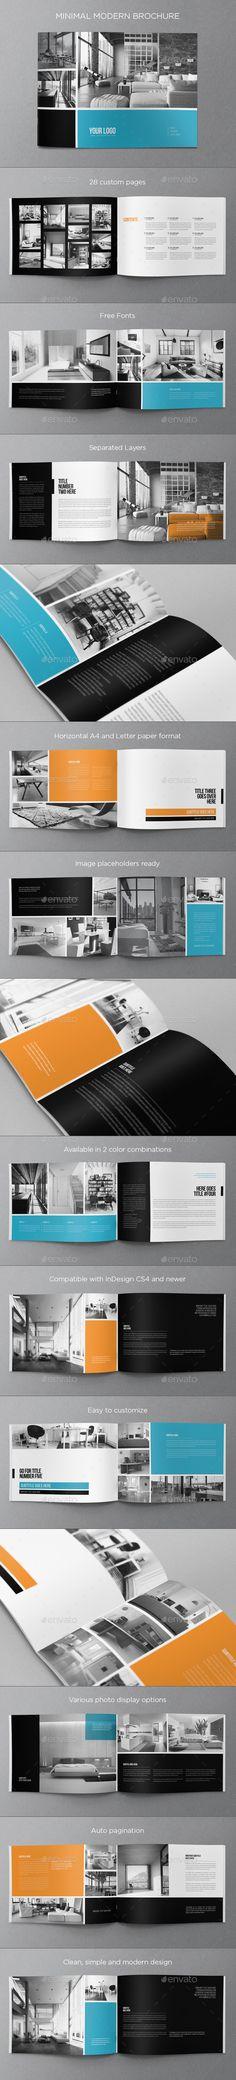 Minimal Modern Brochure - Brochures Print Templates